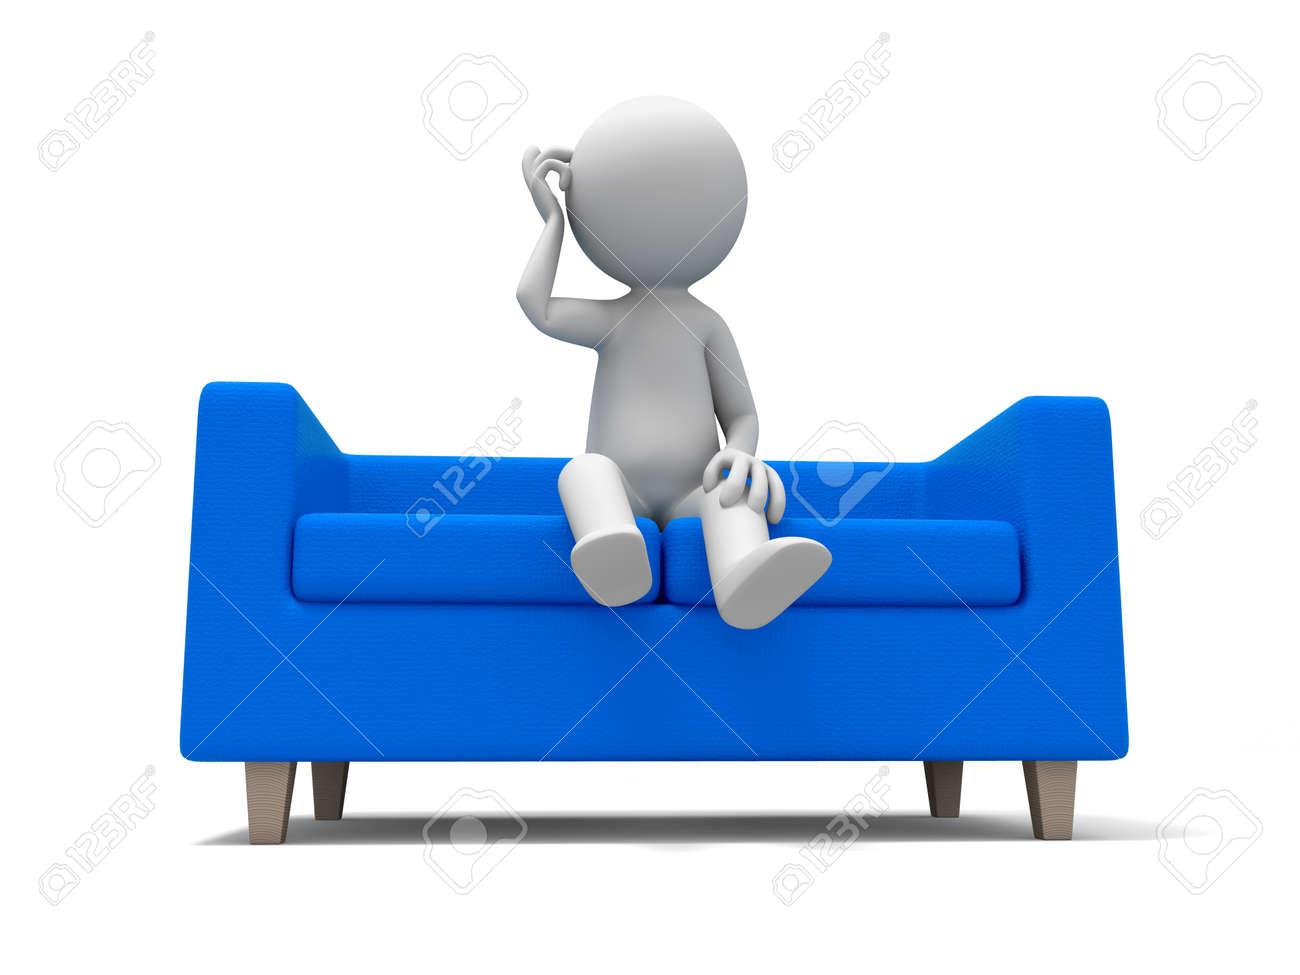 Sofa  a people sitting on  the sofa Stock Photo - 15429672